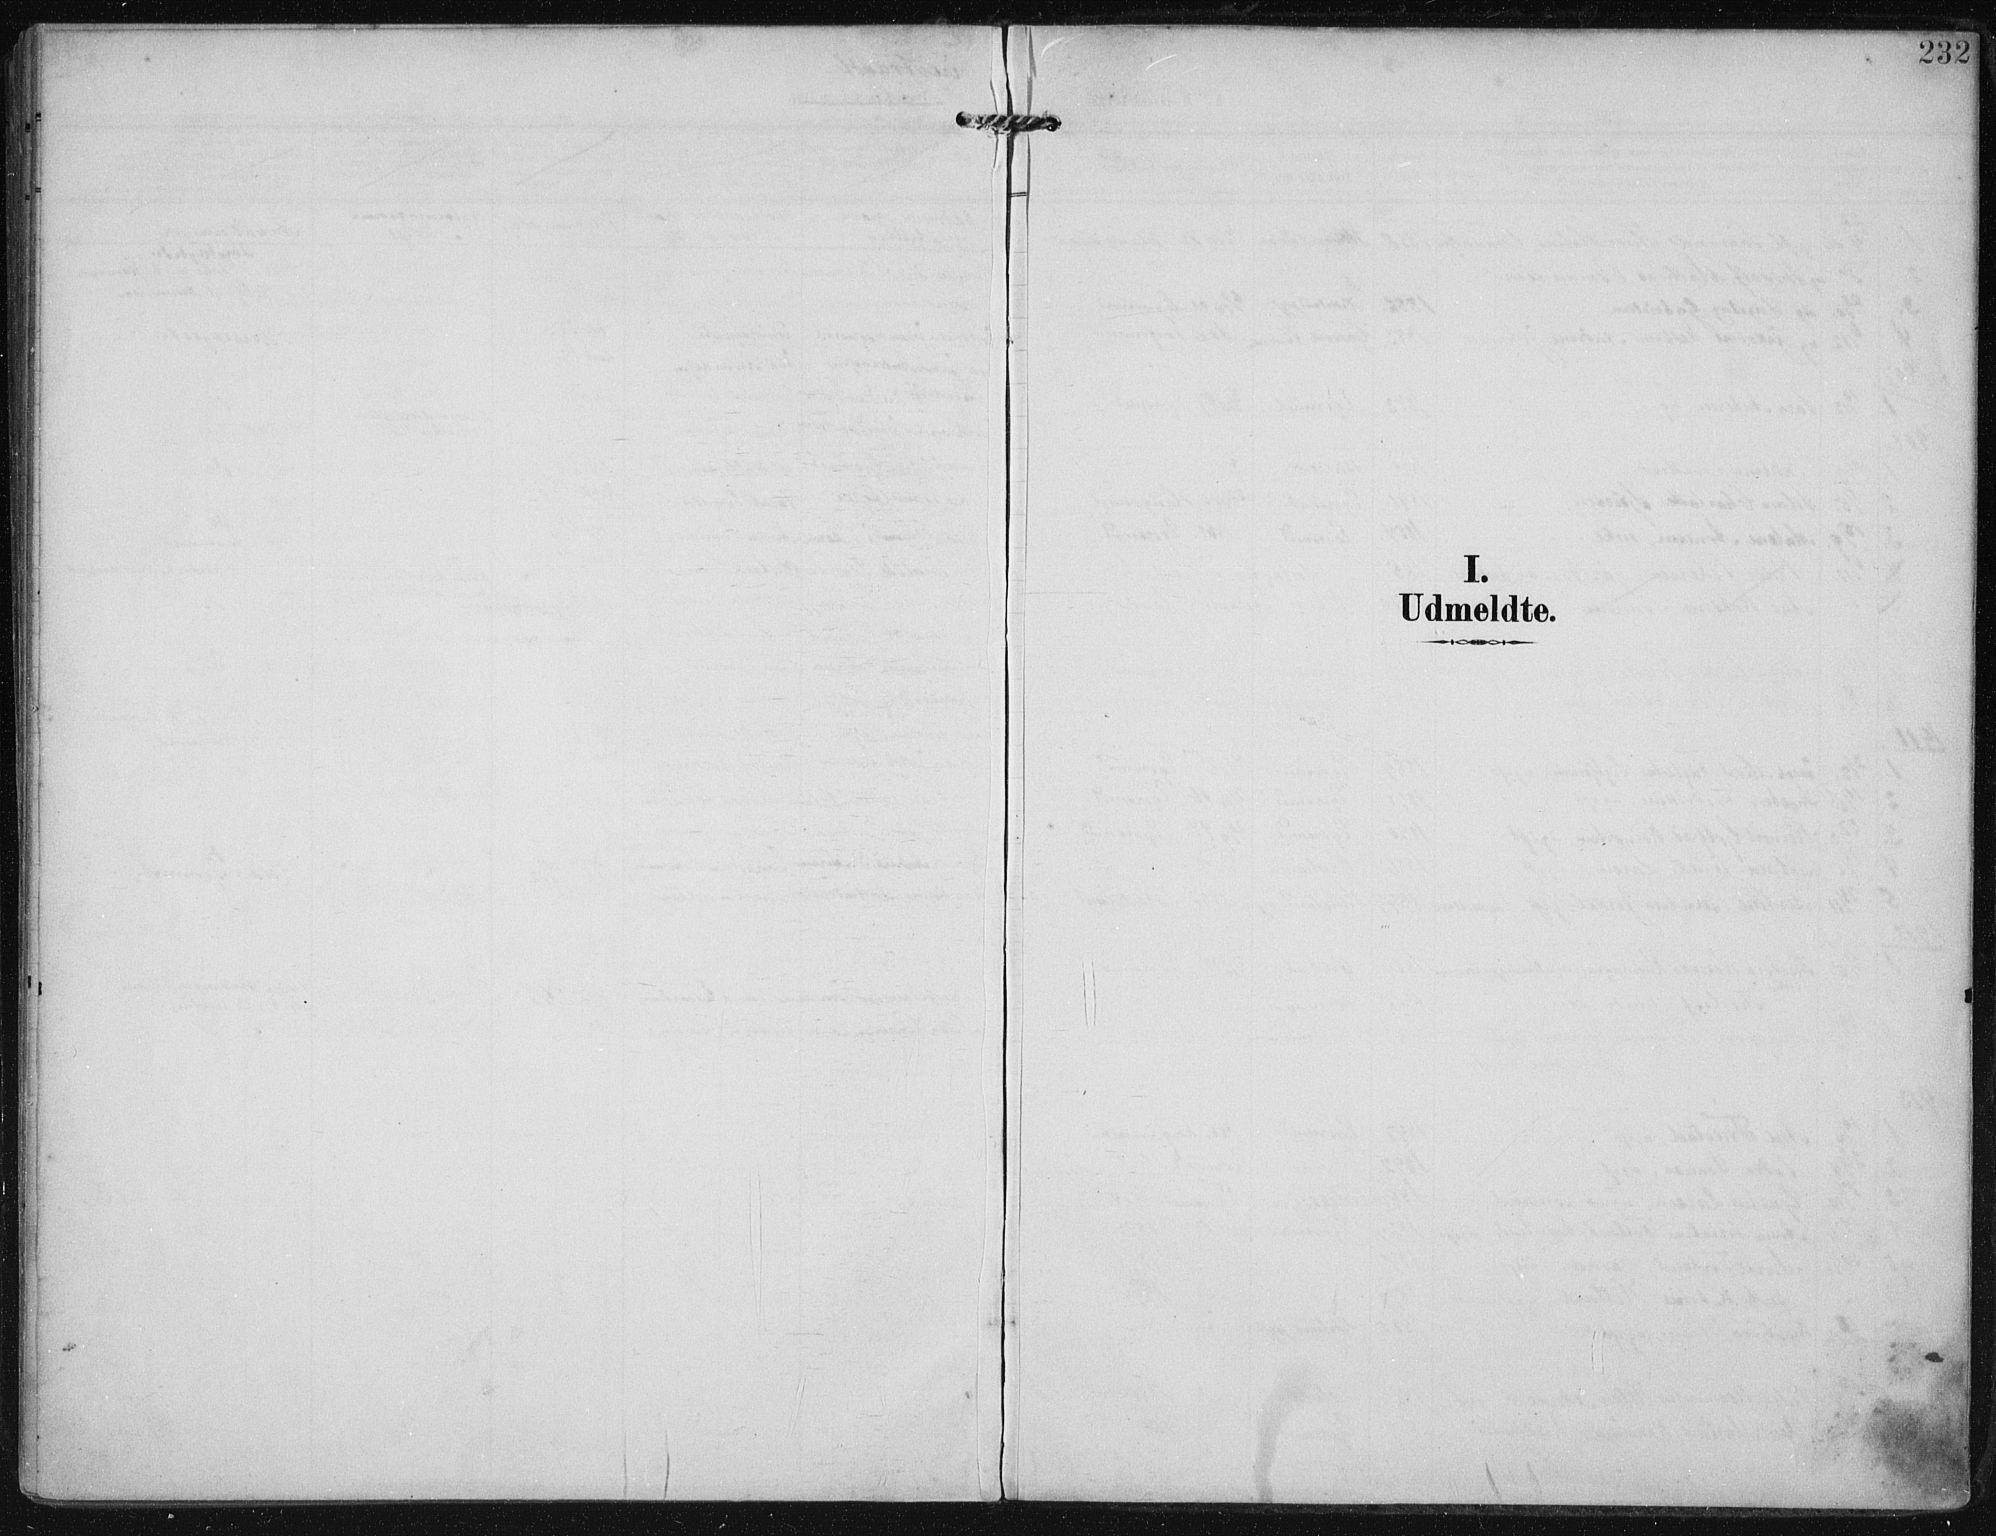 SAST, Egersund sokneprestkontor, Ministerialbok nr. A 21, 1905-1928, s. 232